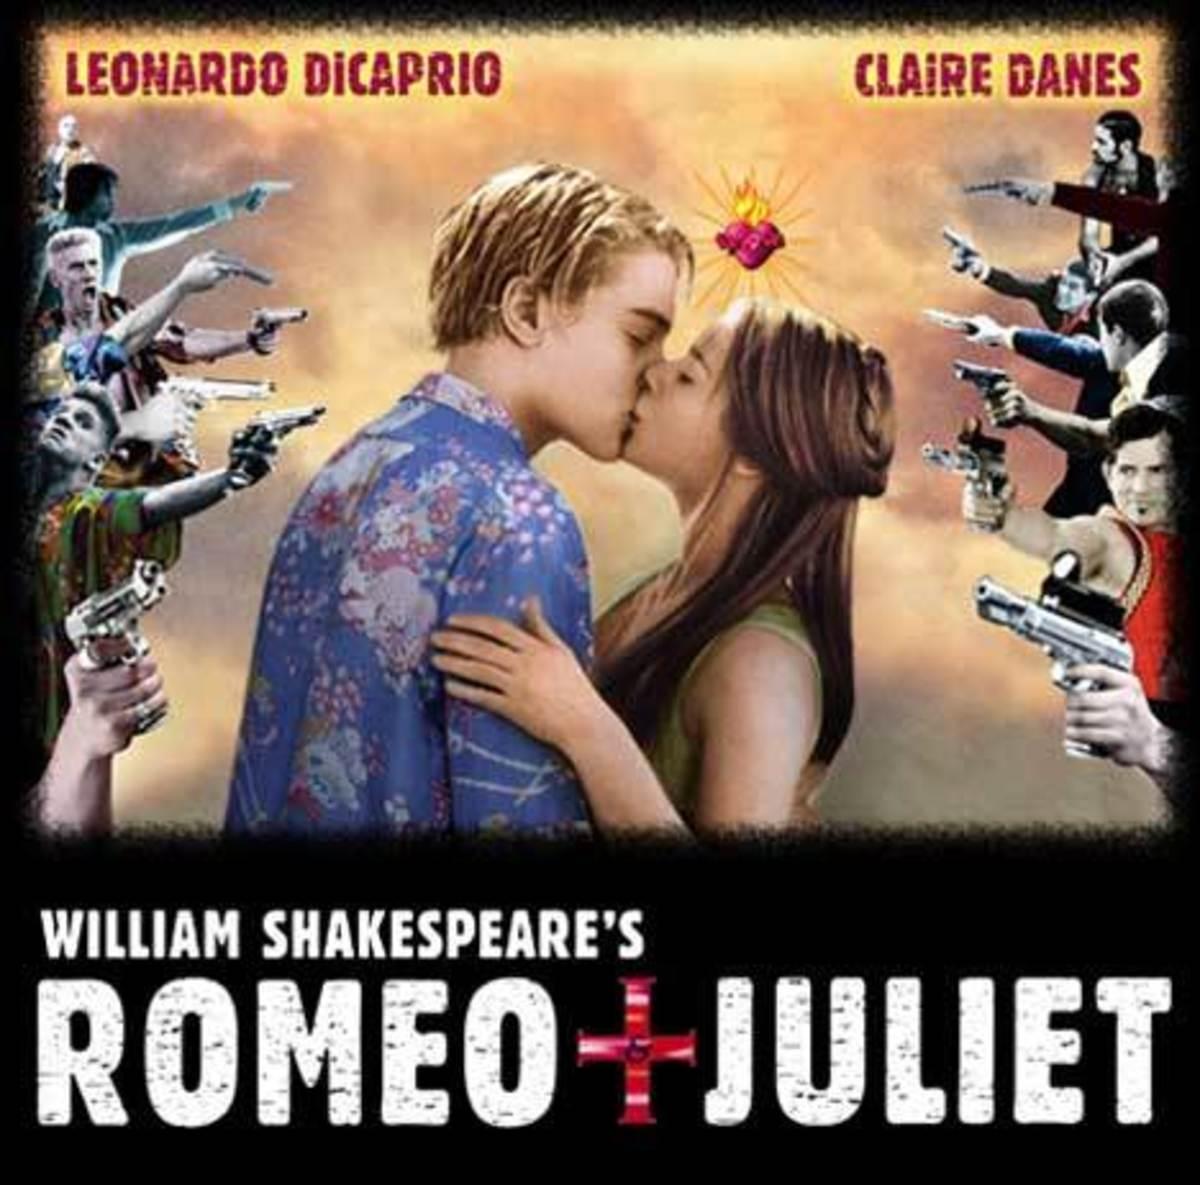 Romeo & Juliet's movie poster